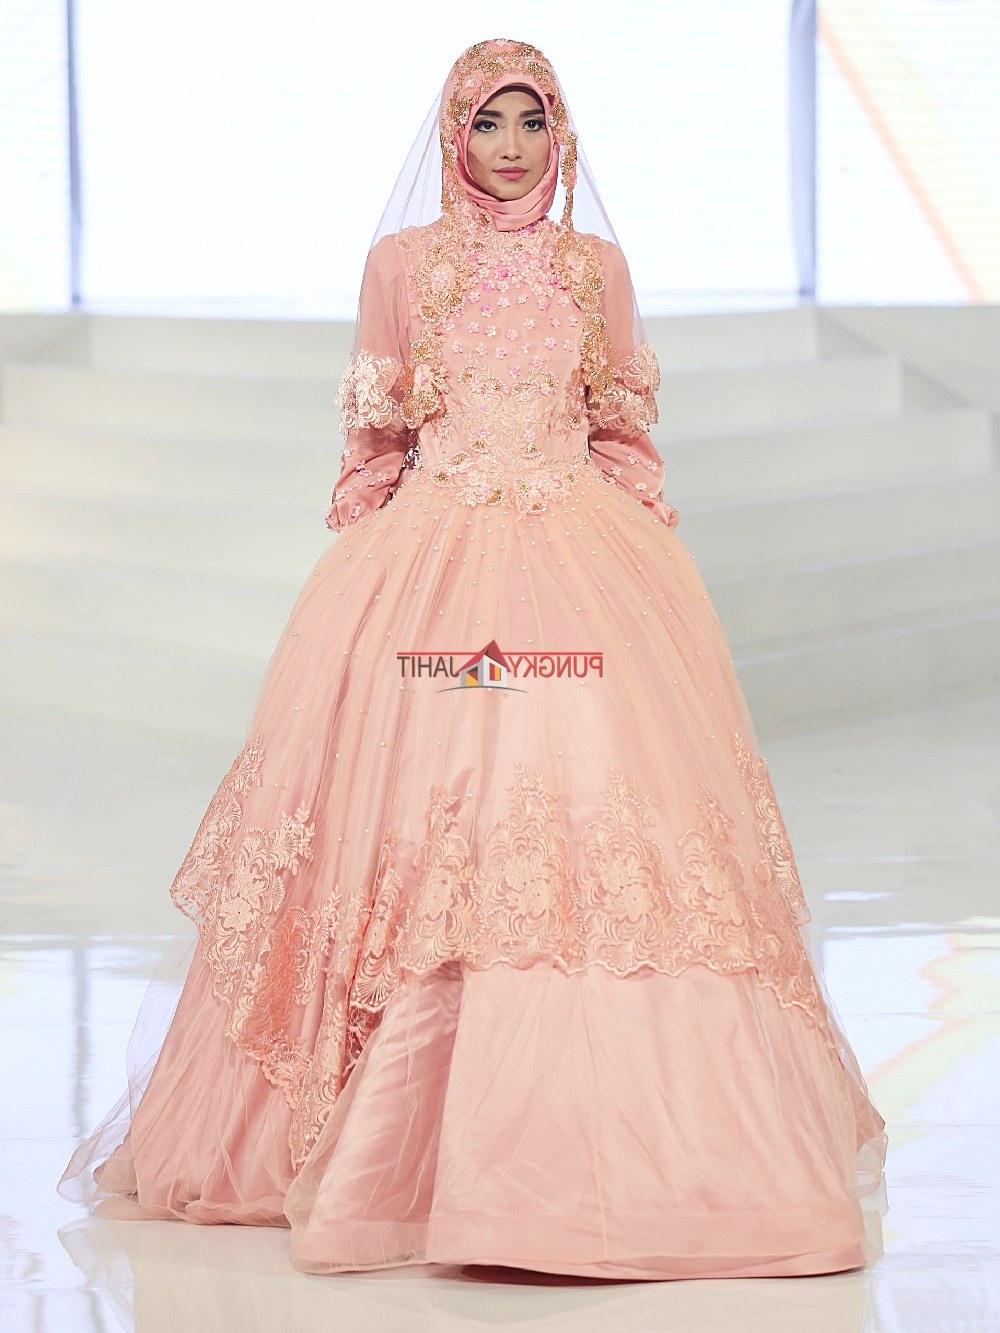 Bentuk Sewa Gaun Pengantin Muslimah Di solo 8ydm Gaun Pengantin Muslimah Dress Muslim Pungky Rumah Jahit